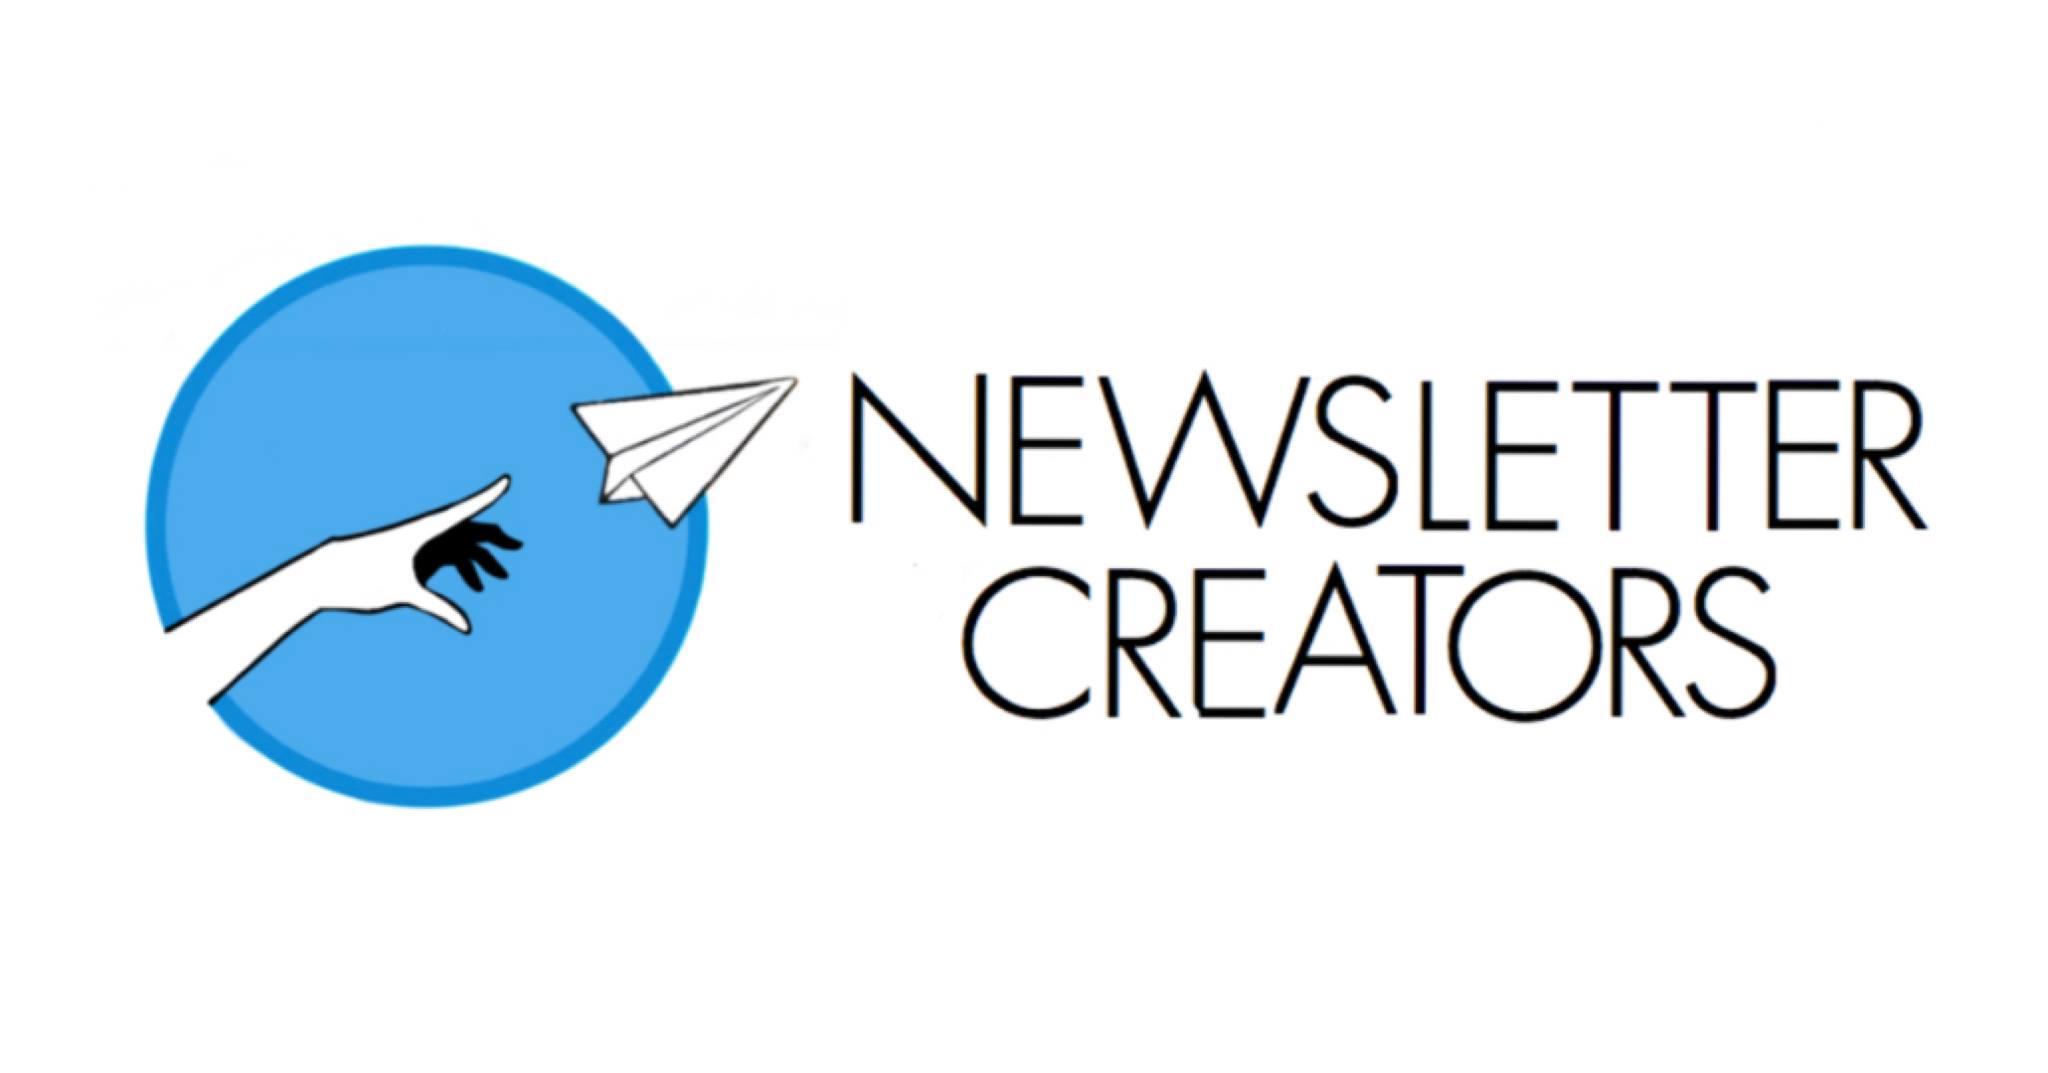 Newsletter Creators